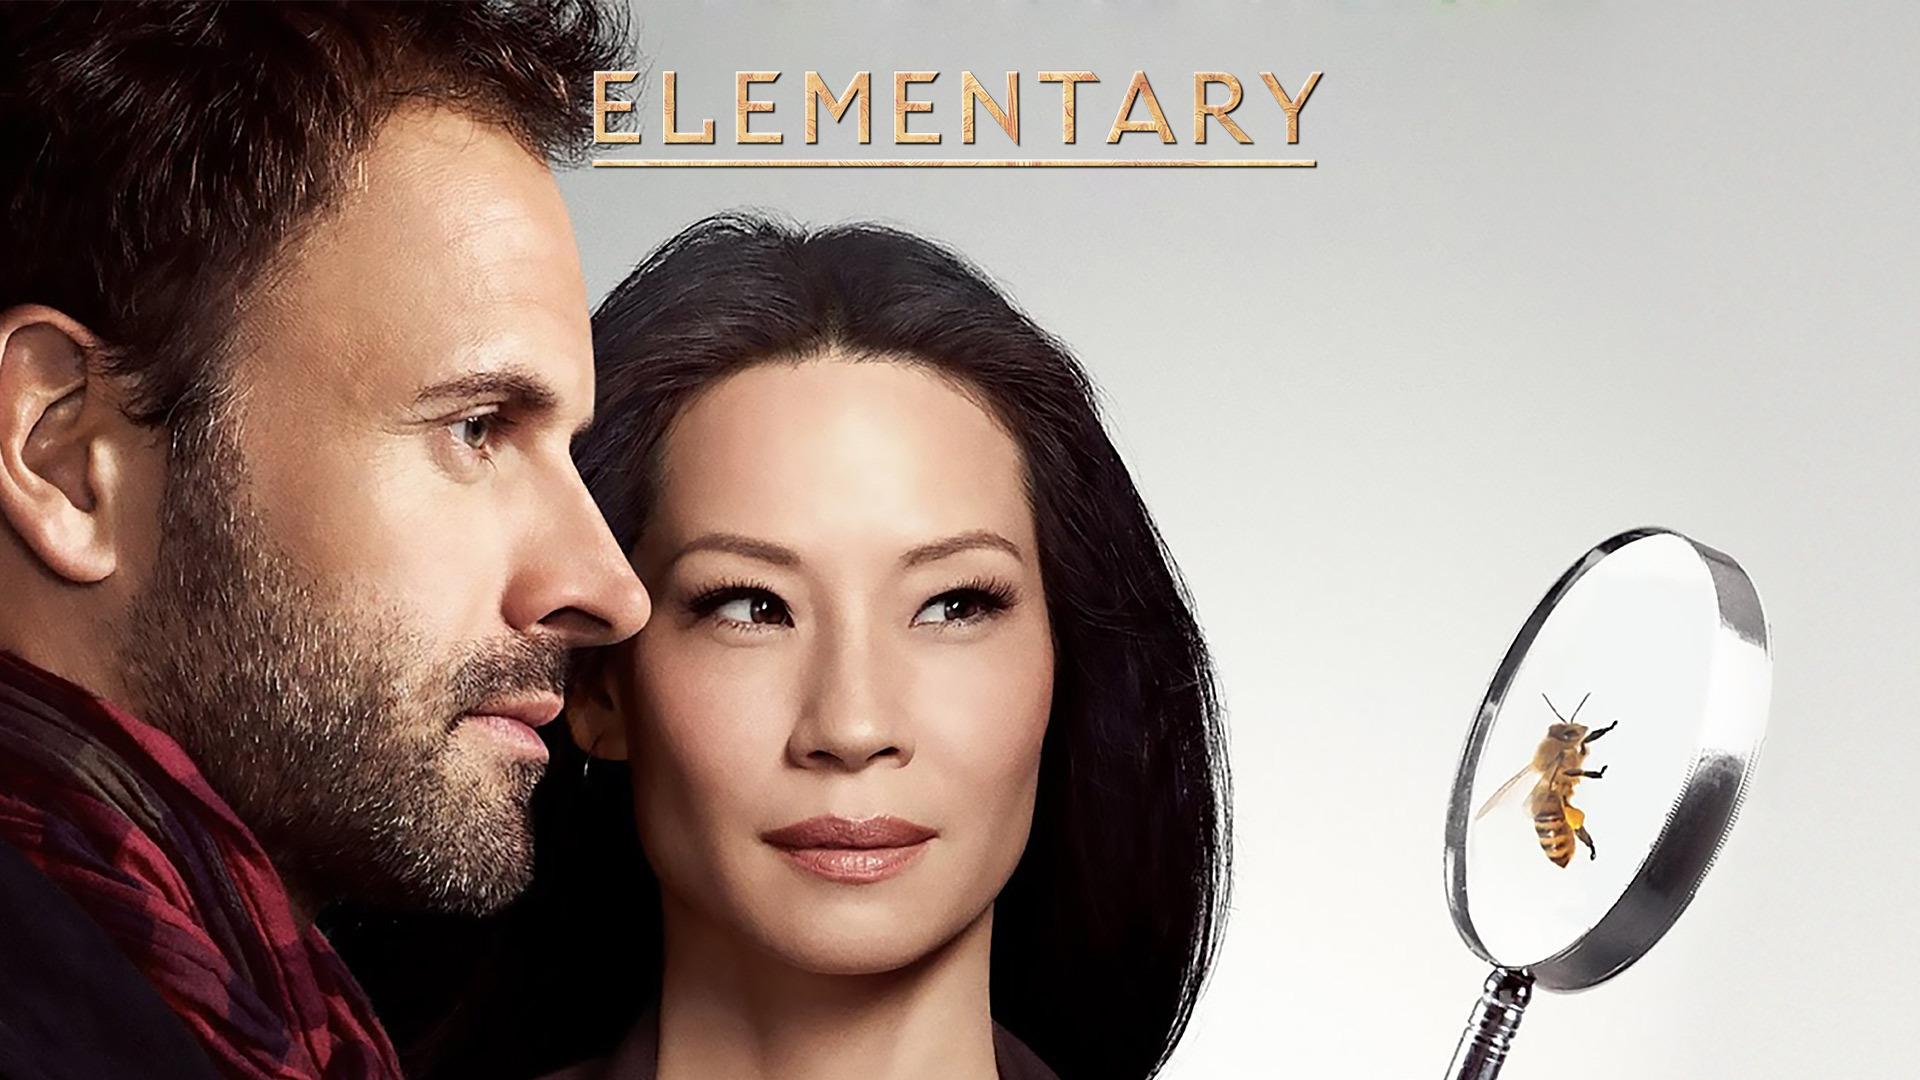 Elementary S03e07 Die Muskatnuss Verbindung The Adventure Of The Nutmeg Concoction Fernsehserien De